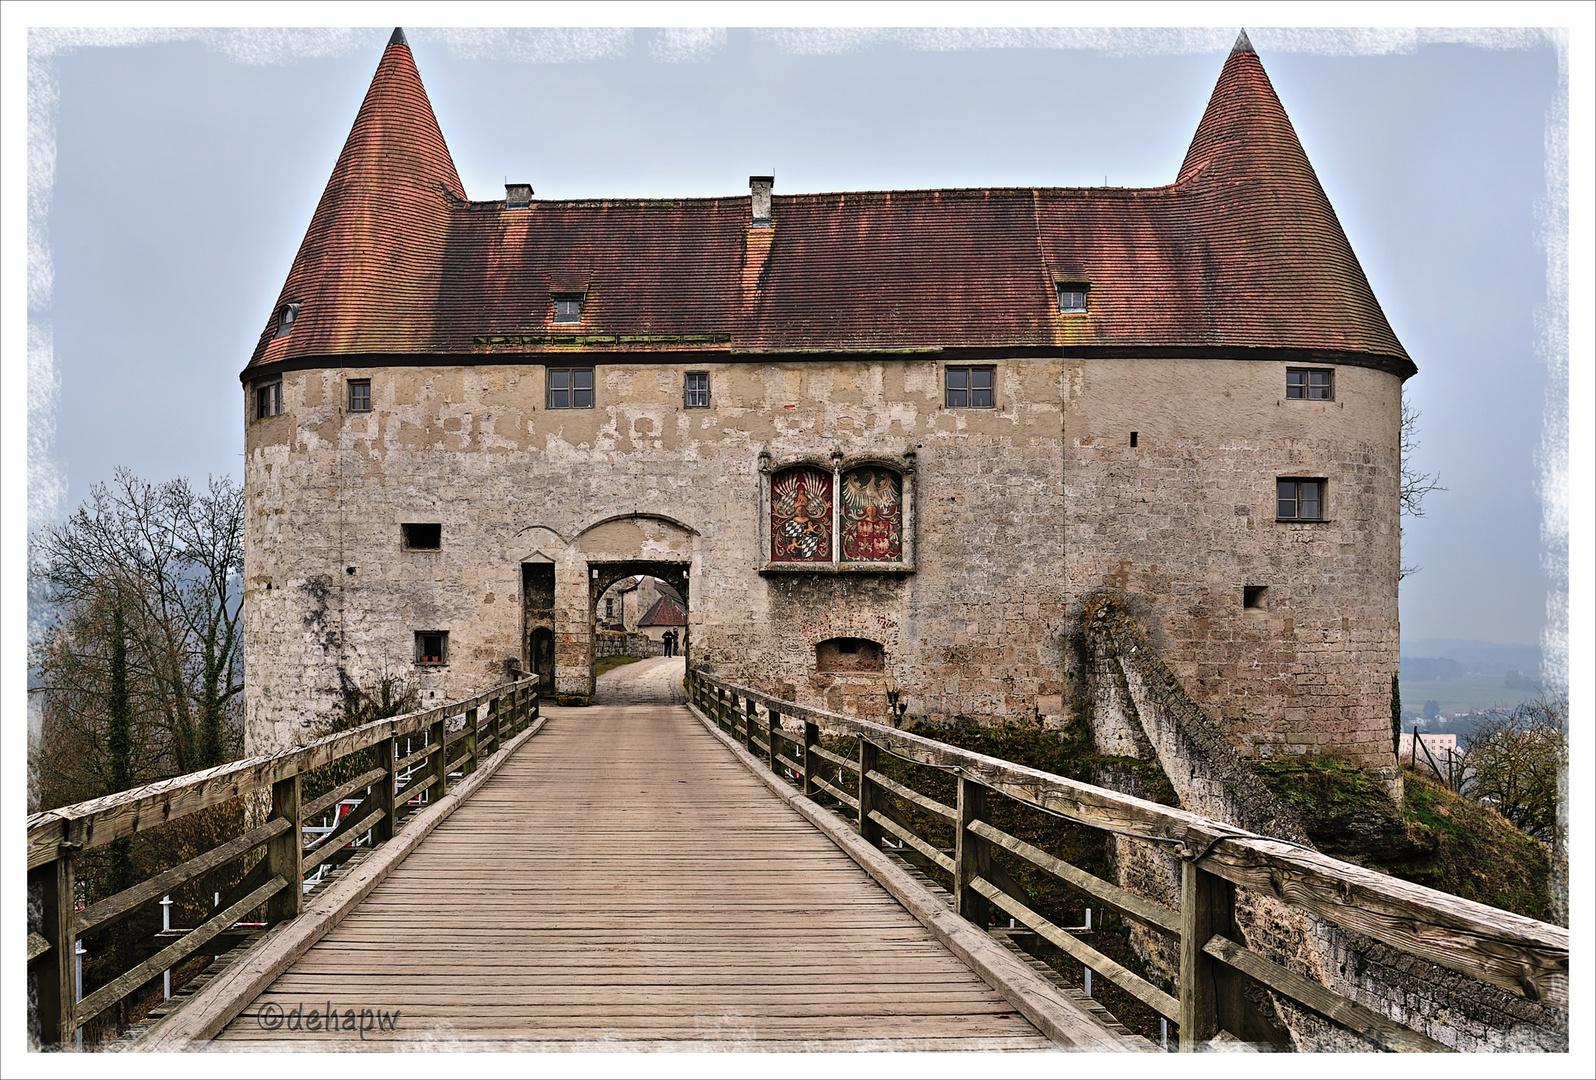 Detailansicht Burganlage Burghausen 2